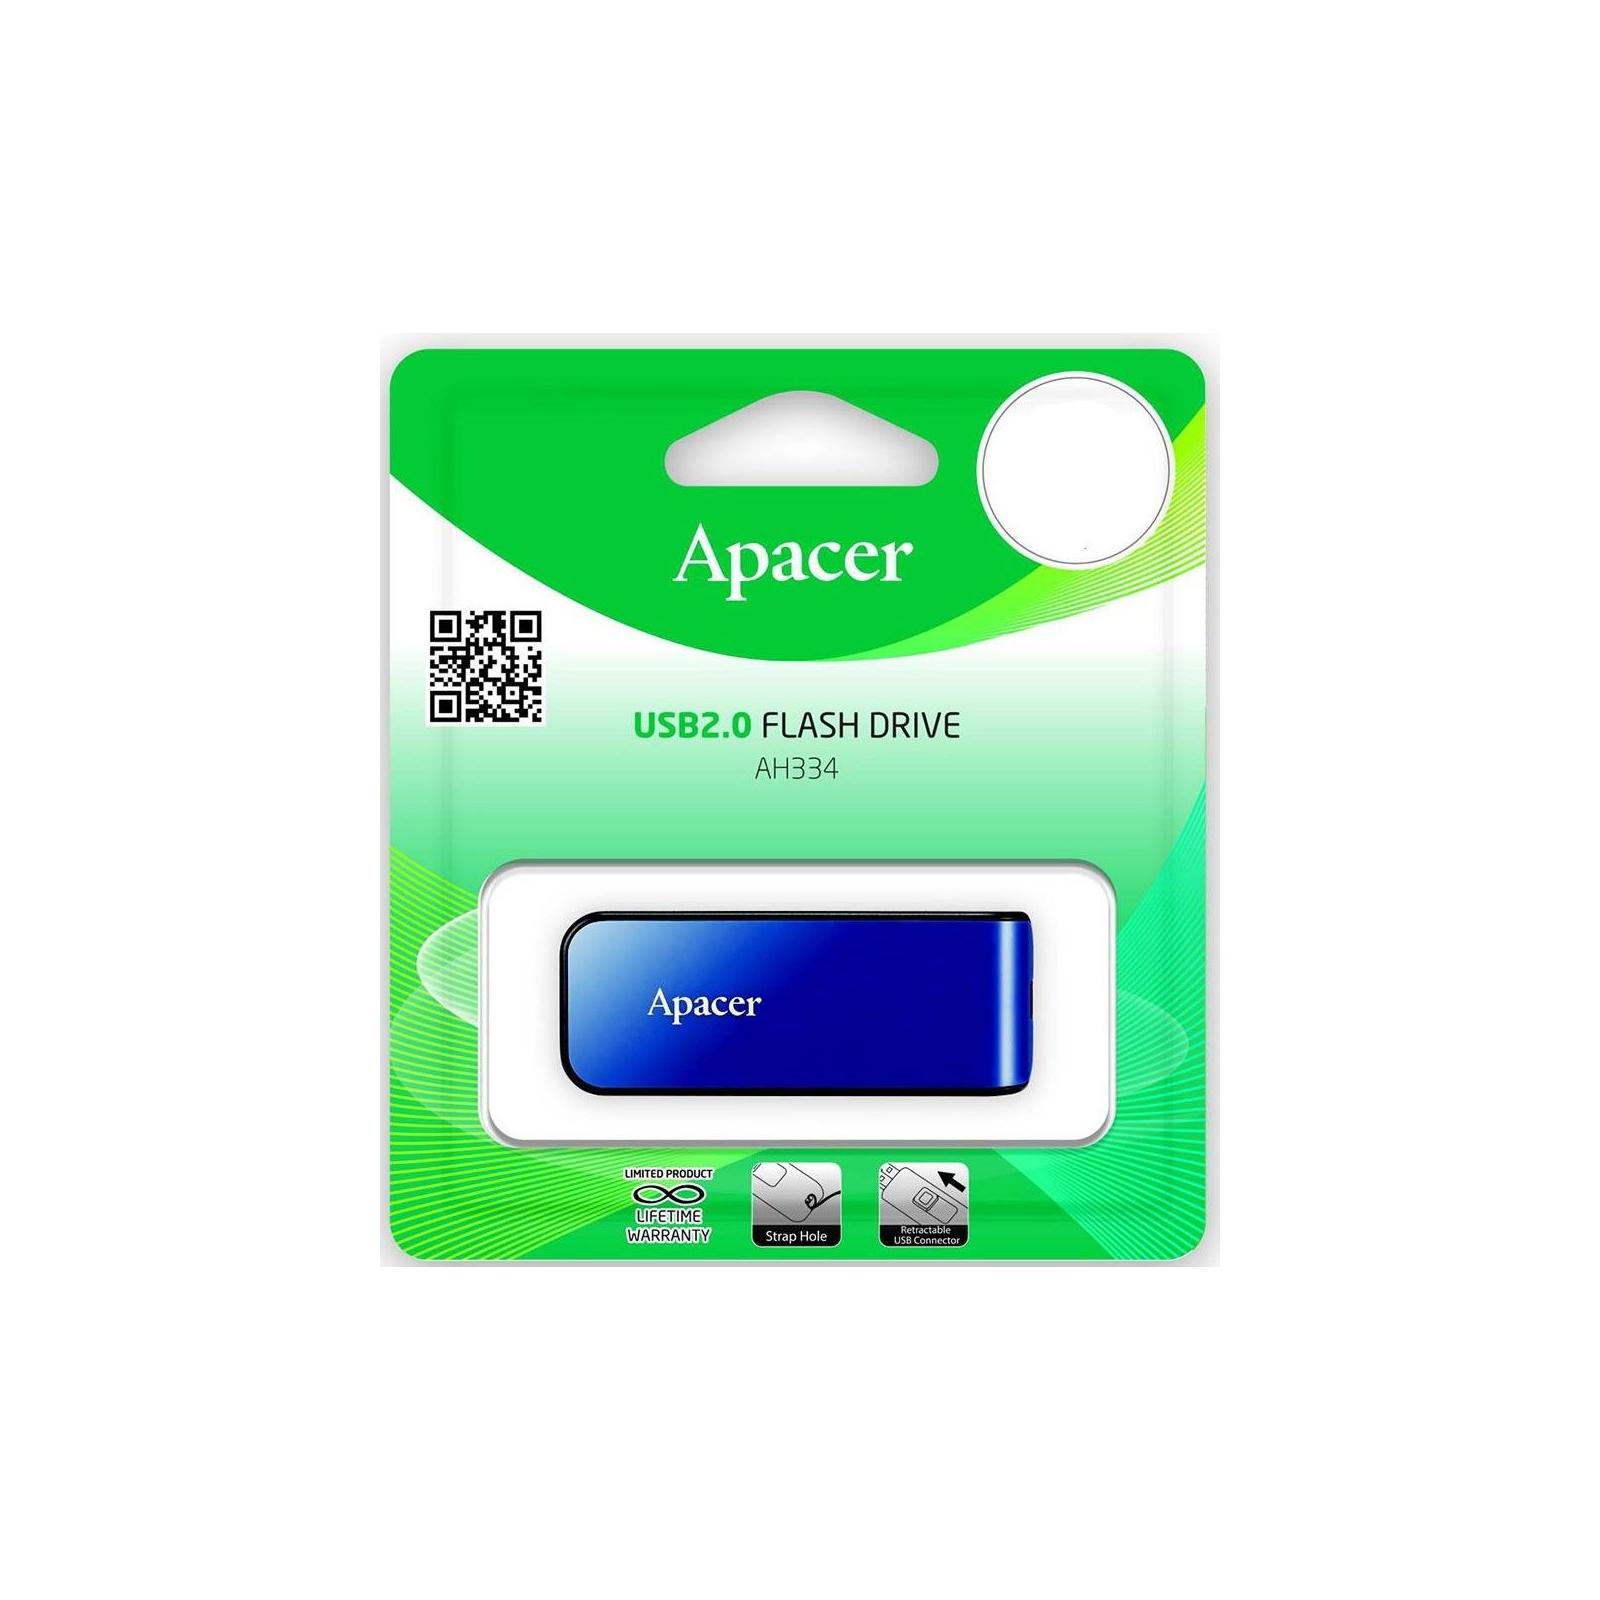 USB флеш накопитель Apacer 64GB AH334 blue USB 2.0 (AP64GAH334U-1) изображение 6